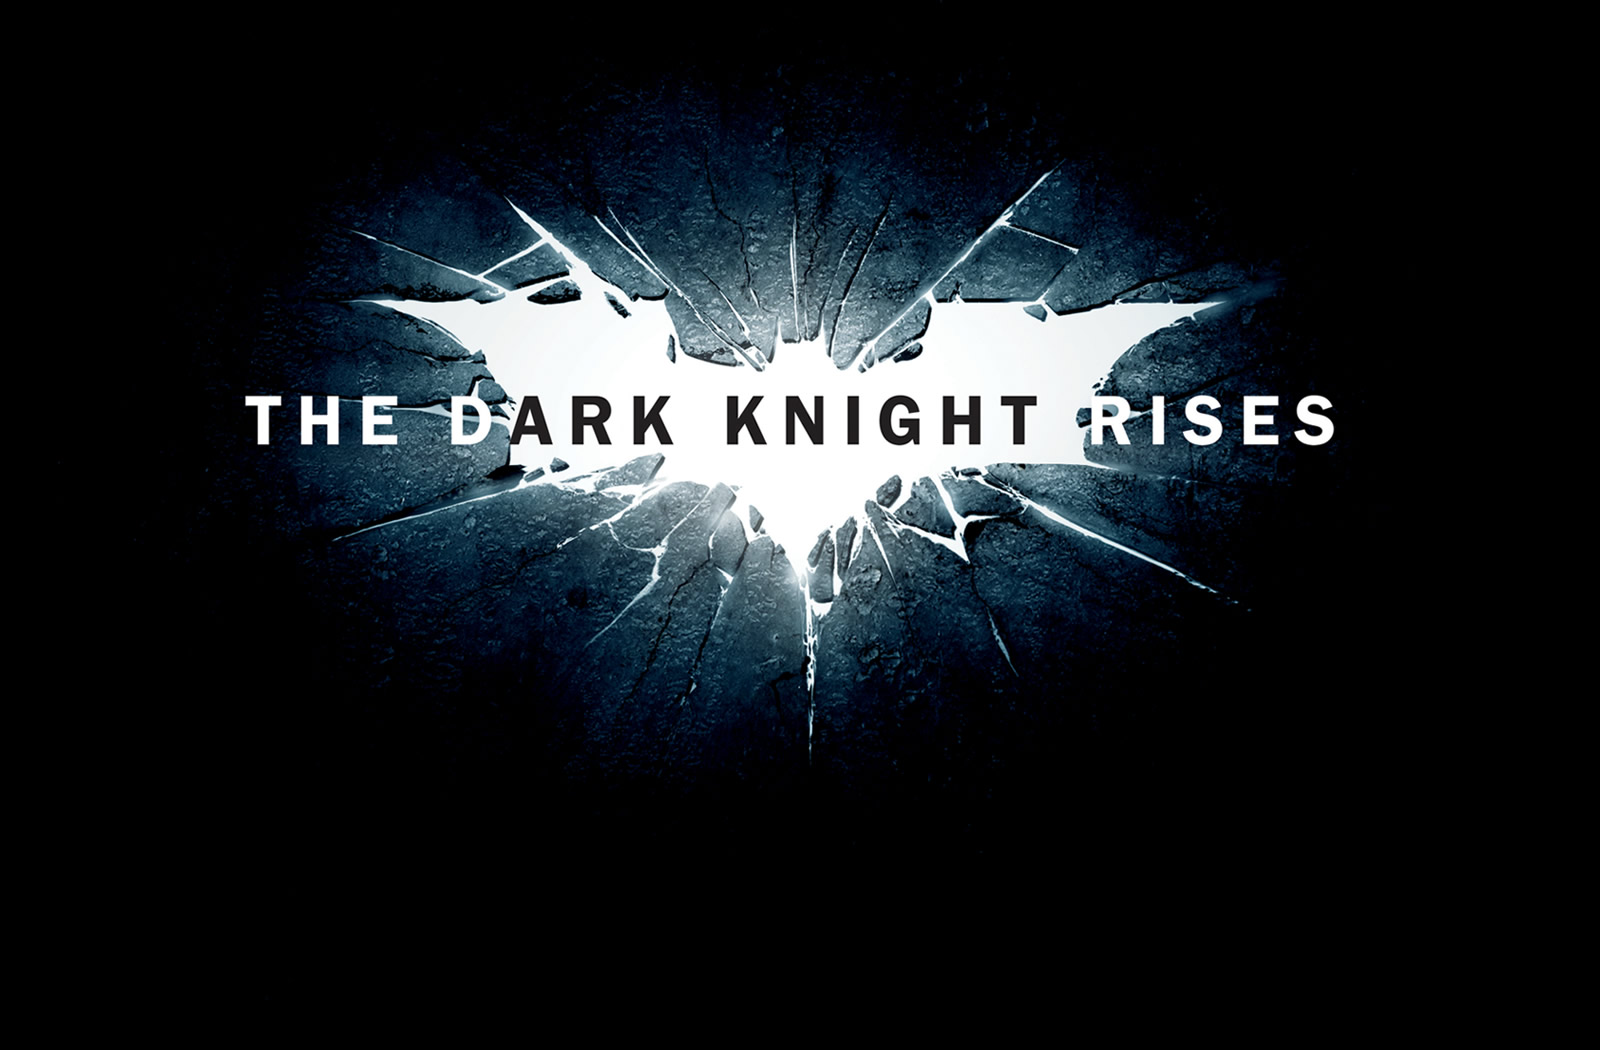 tdkr logo the dark knight rises photo 24298122 fanpop